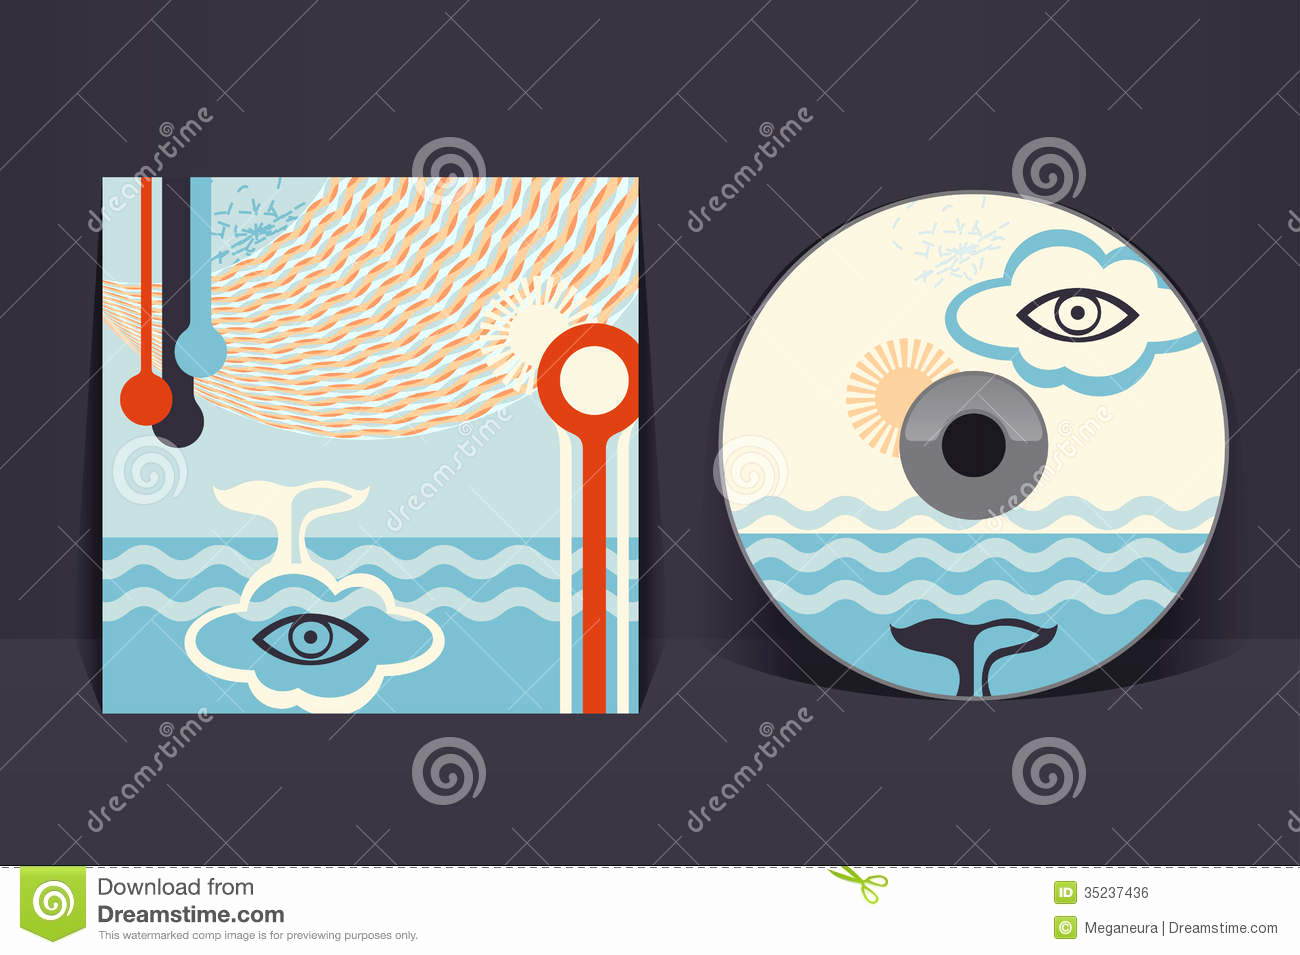 Cd Cover Design Template Elegant Cd Cover Design Template Stock Vector Illustration Of